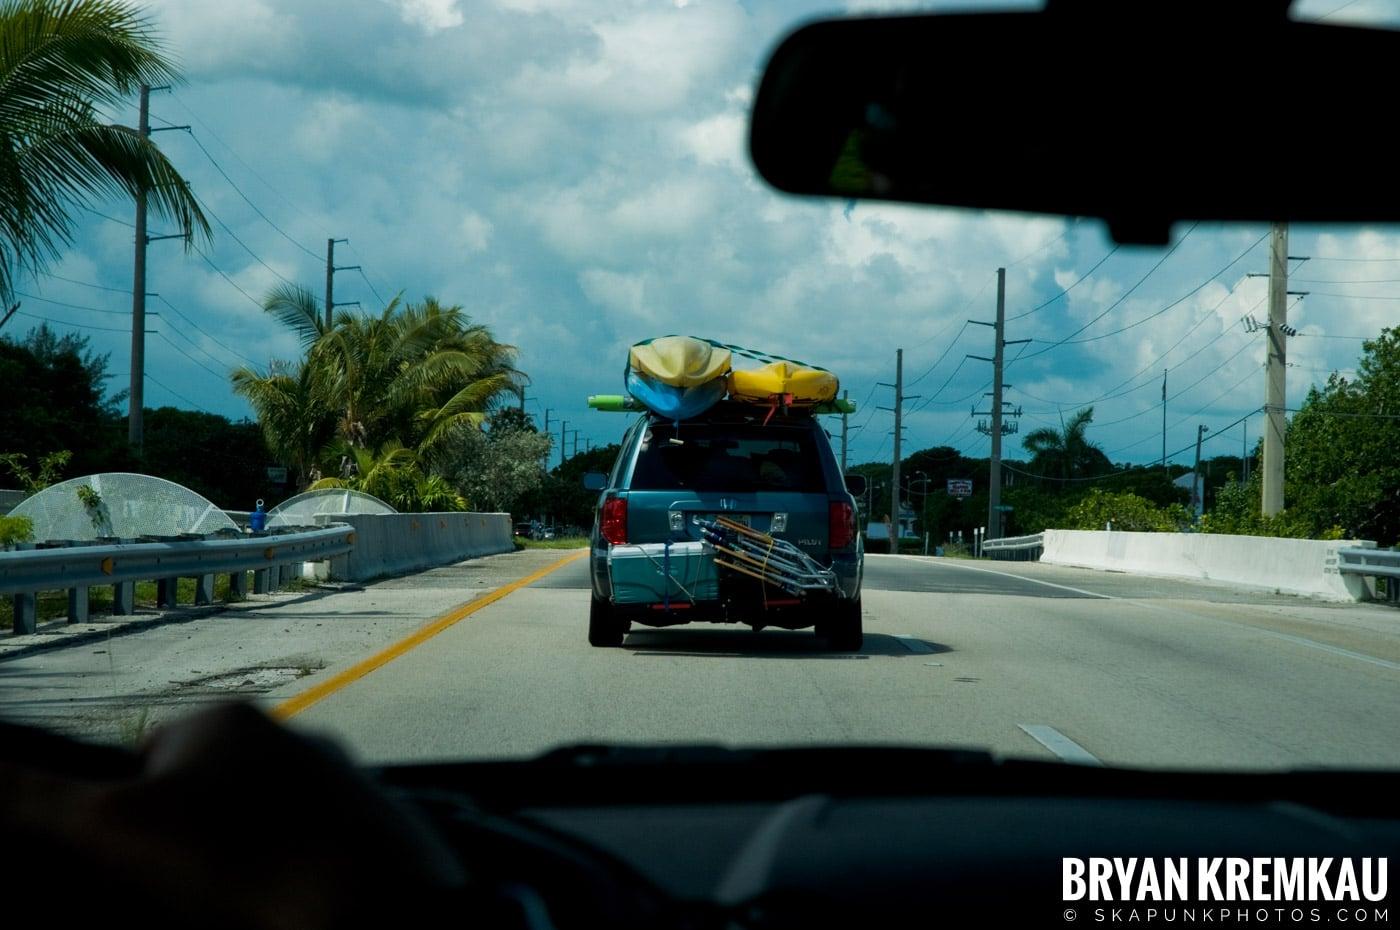 Florida Keys Vacation - 7.09.10 - 7.15.10 (88)